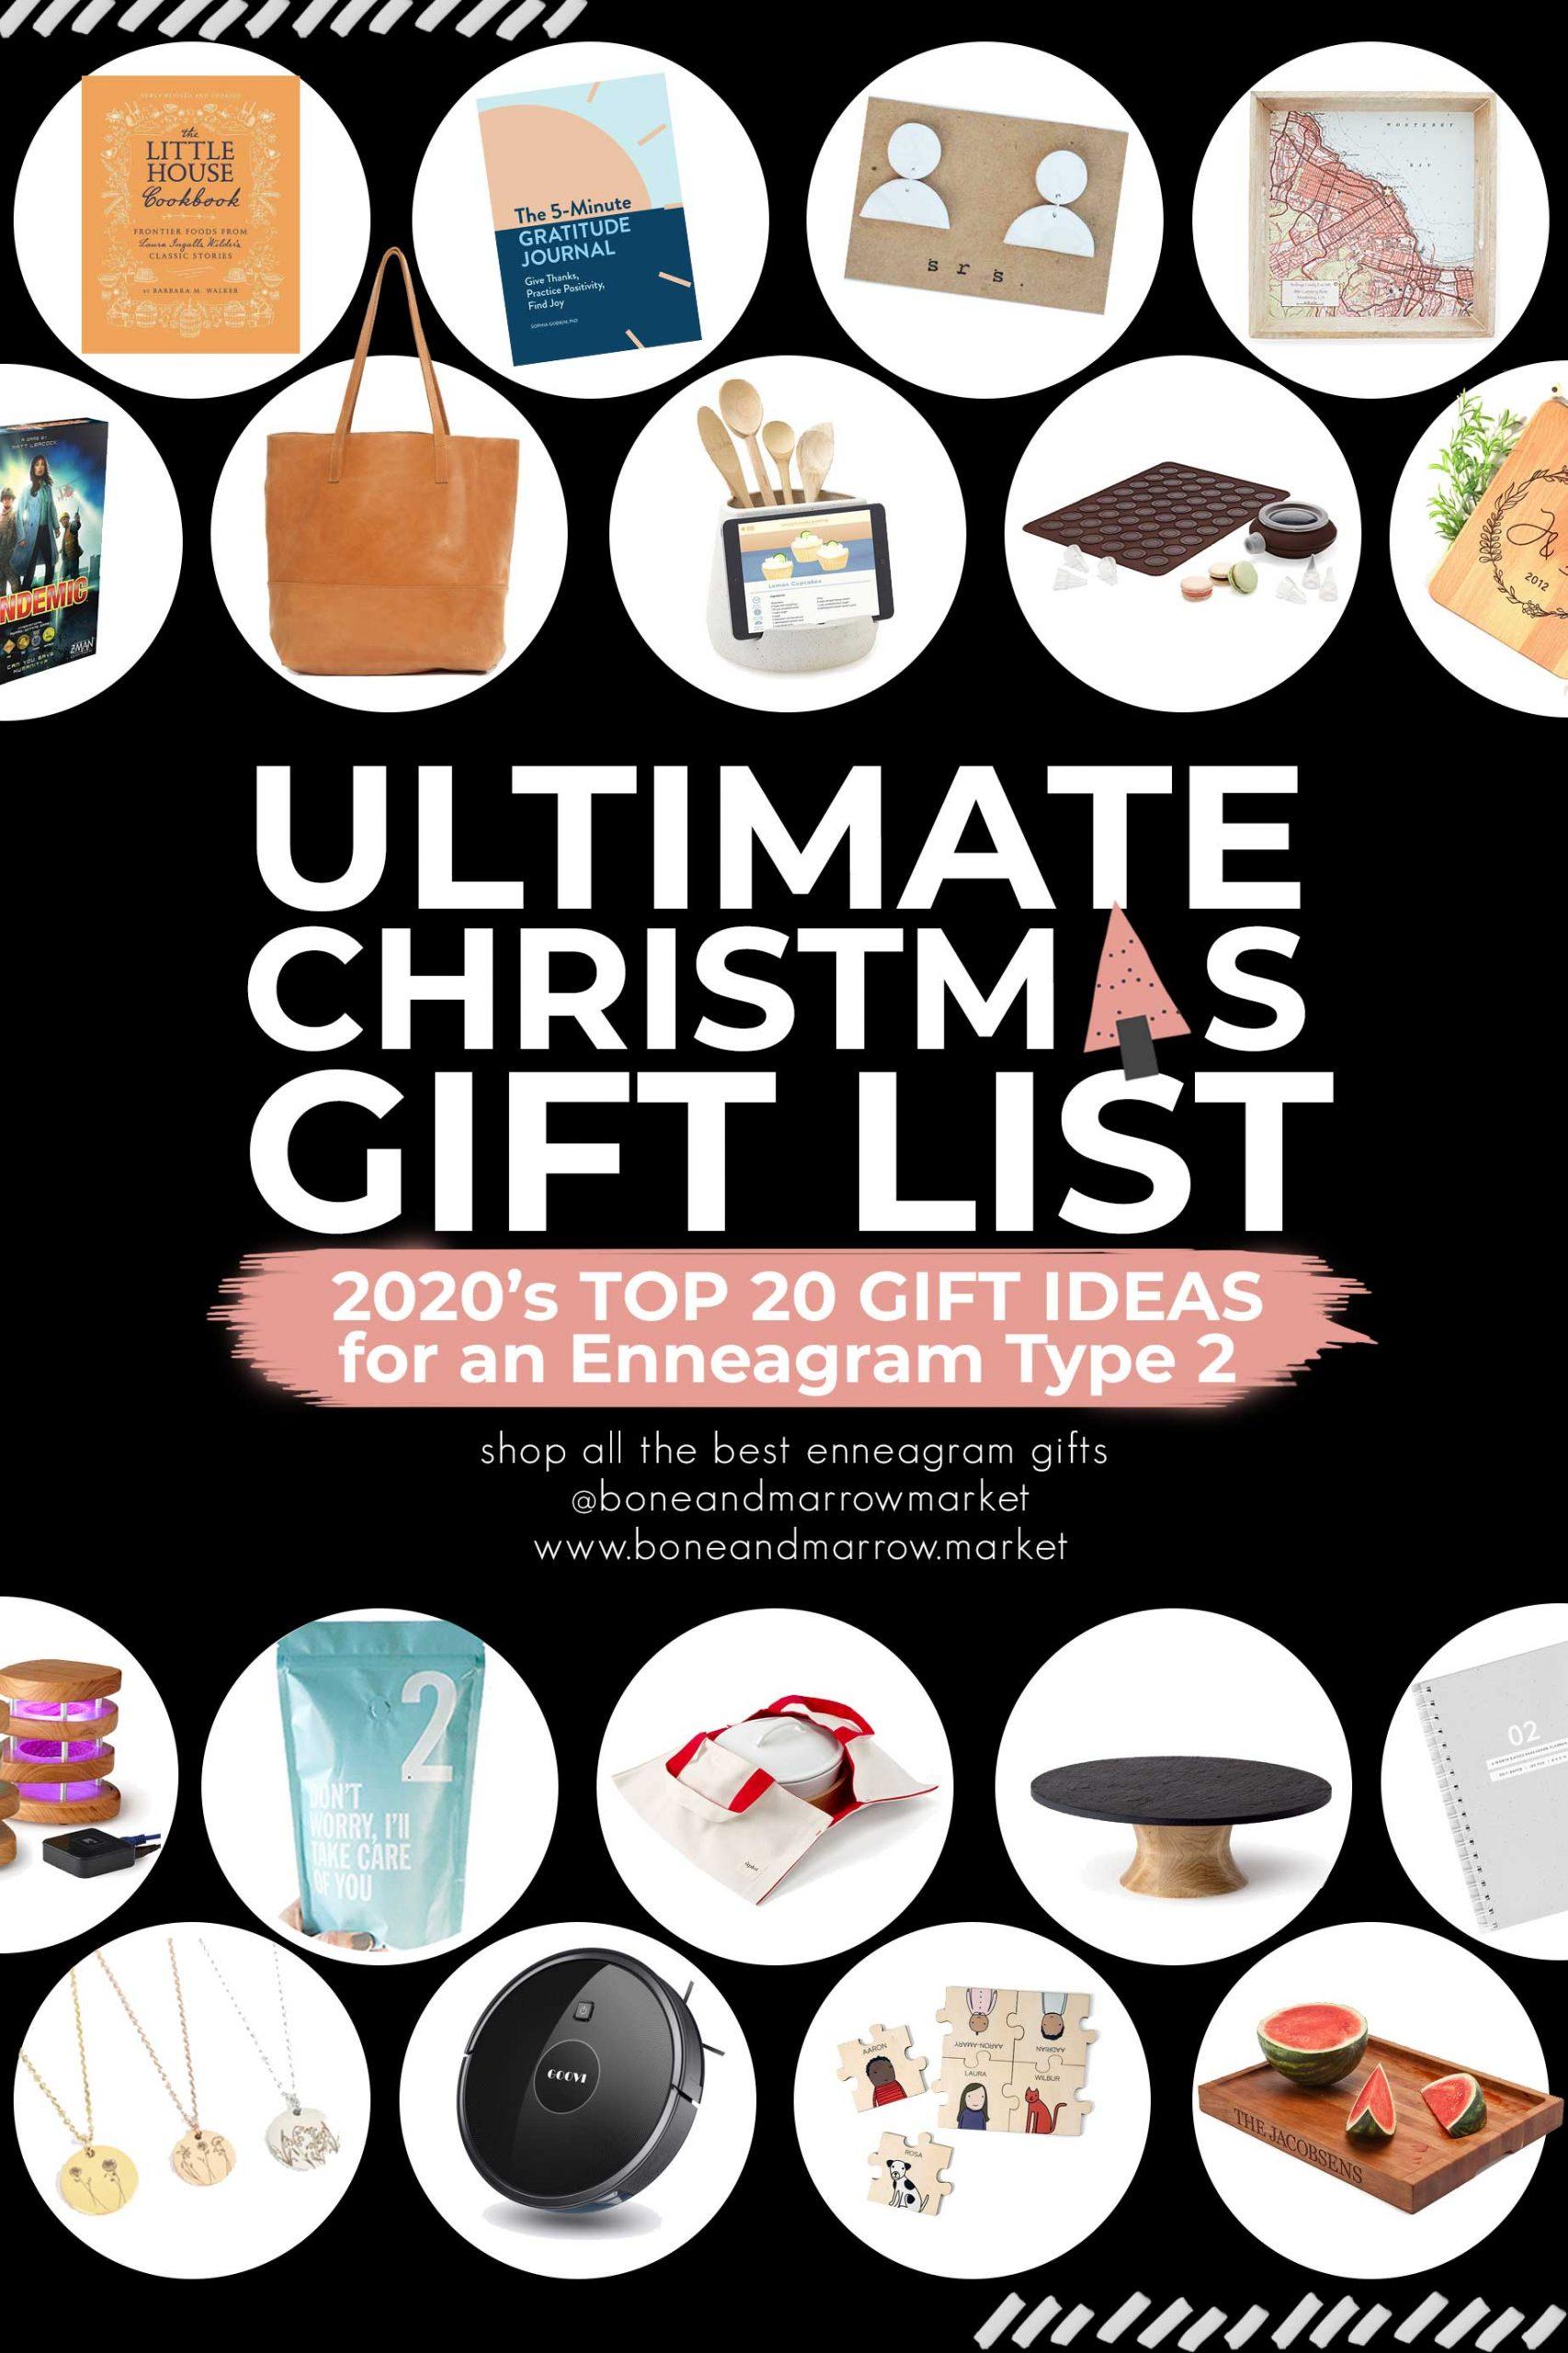 Ultimate Christmas Gift Ideas for an Enneagram 2